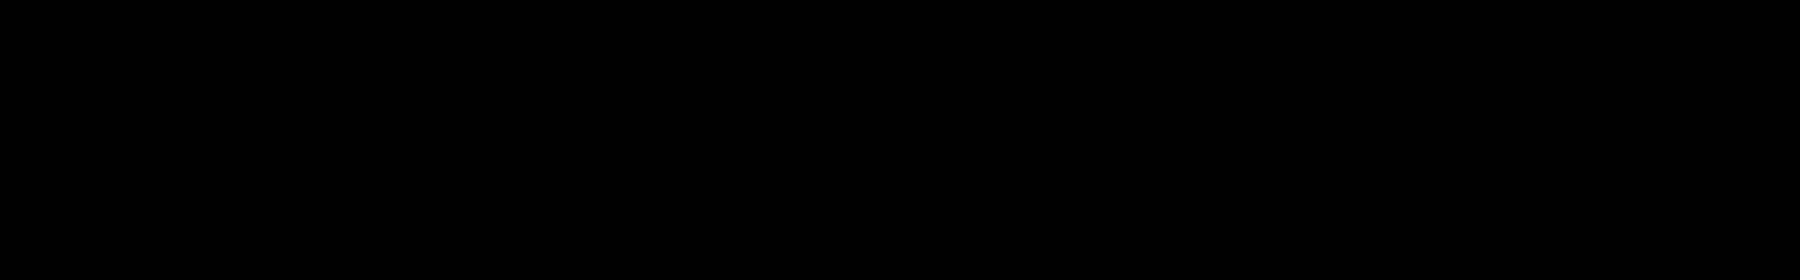 Rati Ricch audio waveform